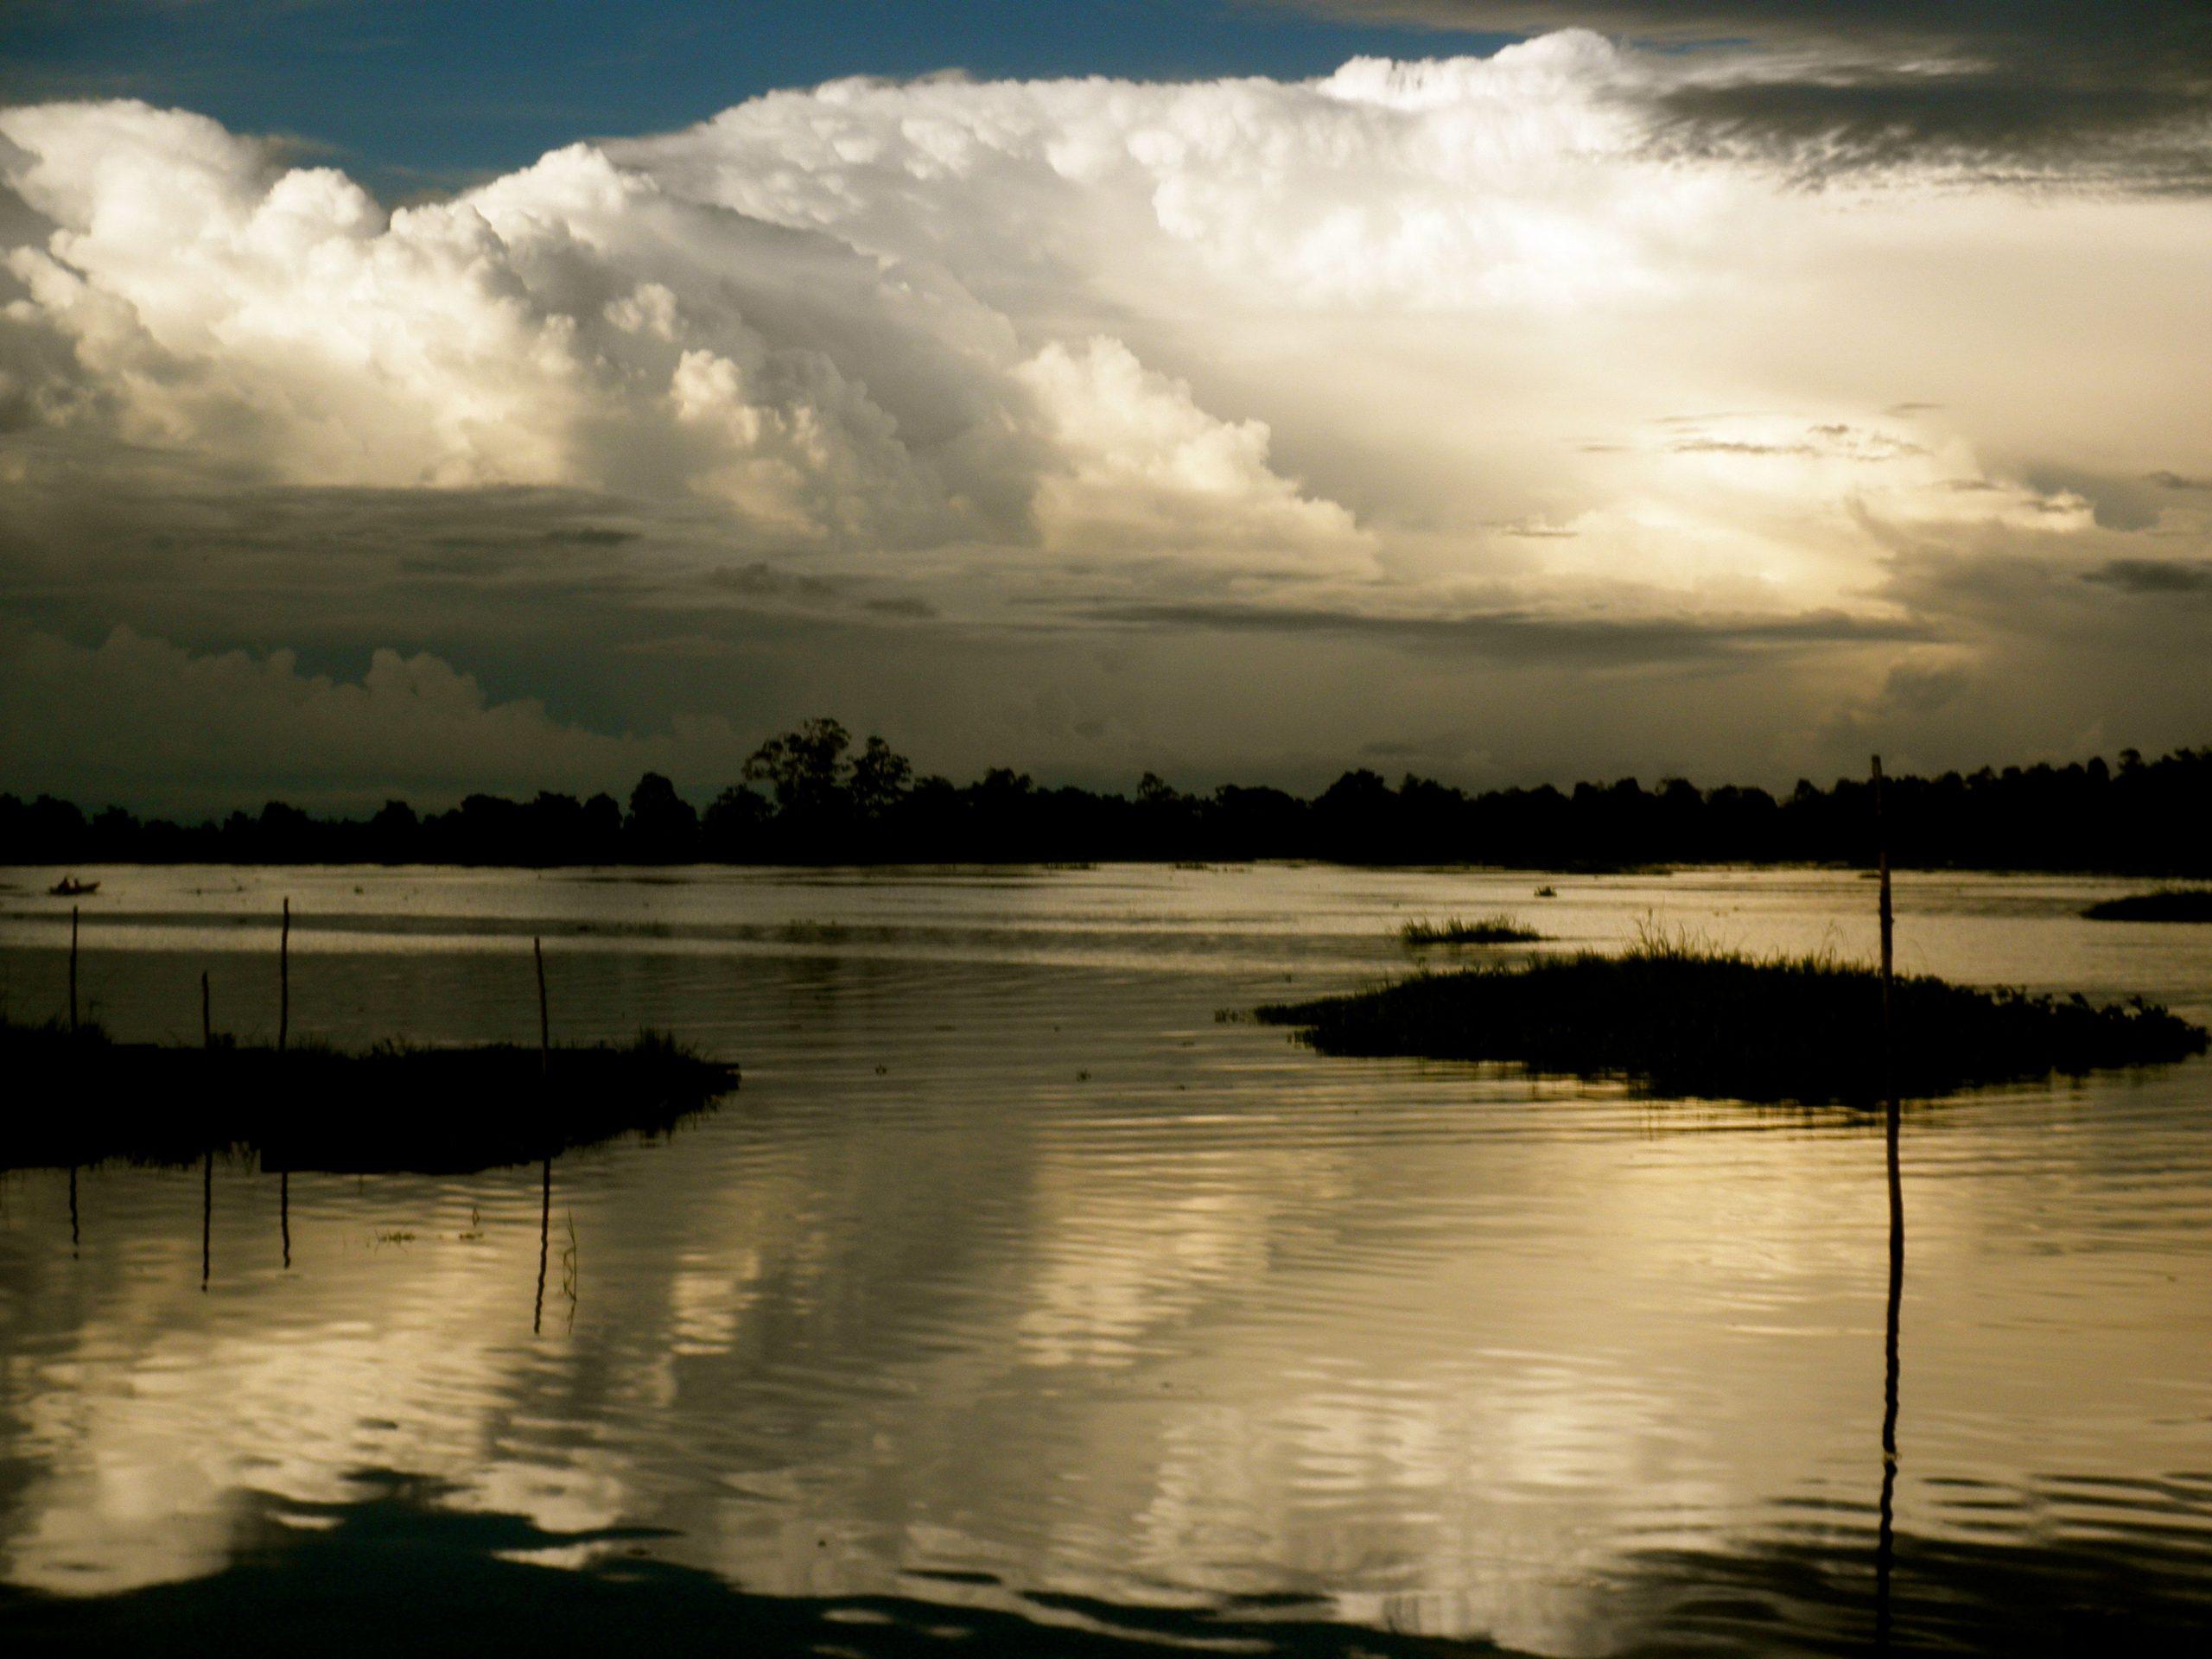 Tanjung Isuy, East Kalimantan